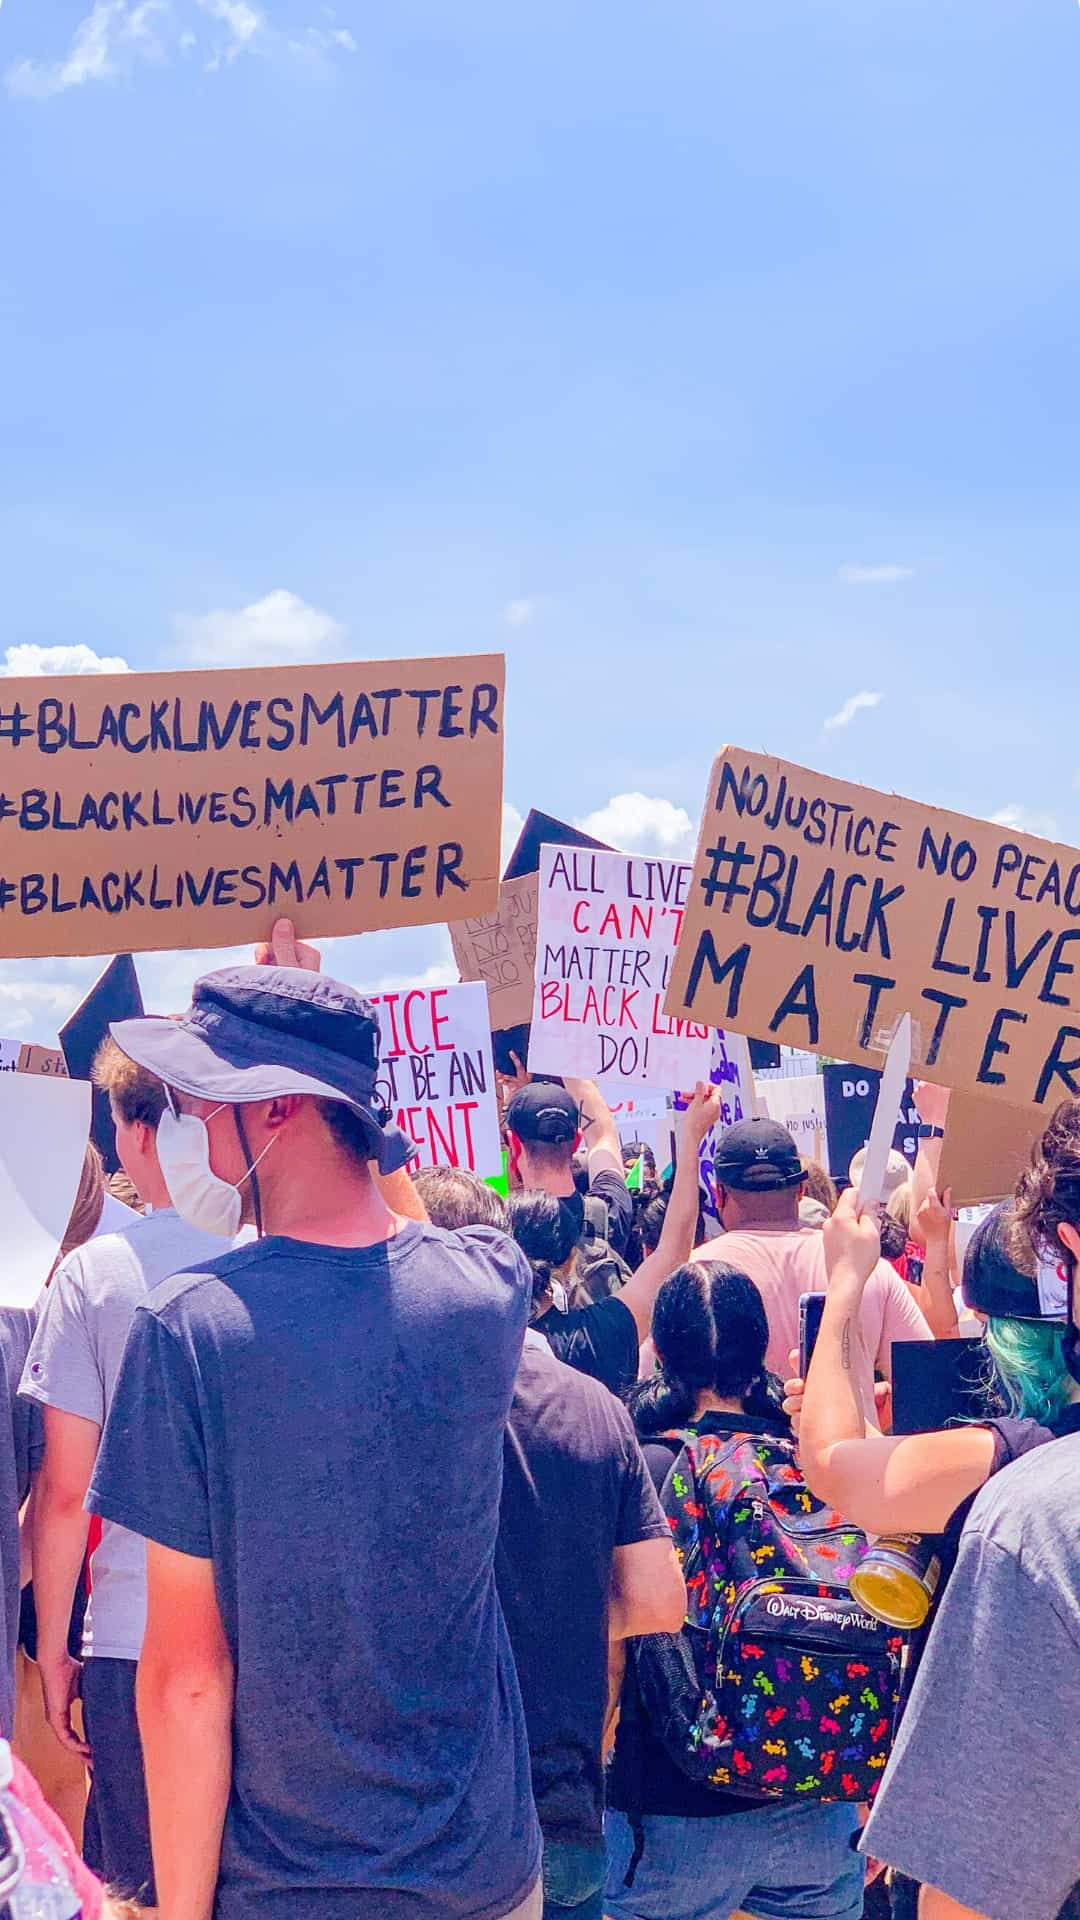 no justice no peace - Black lives matter protest sign